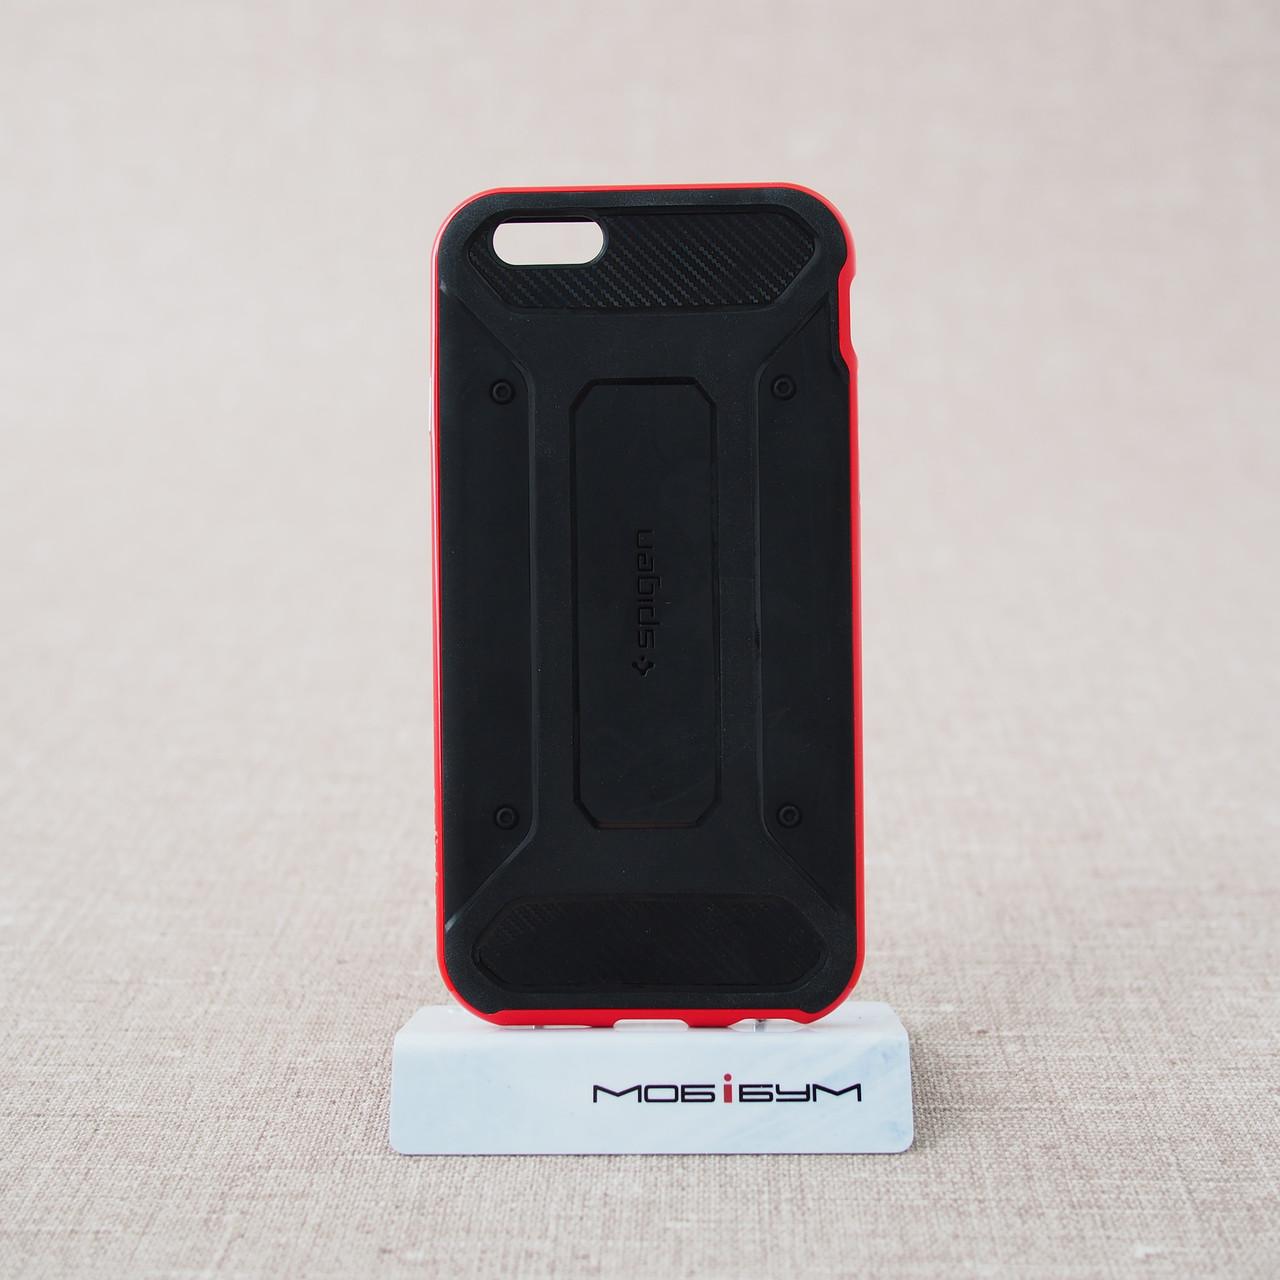 Чехол Spigen Neo Hybrid Carbon iPhone 6 Dante red (SGP11623) EAN/UPC: 8809404219580